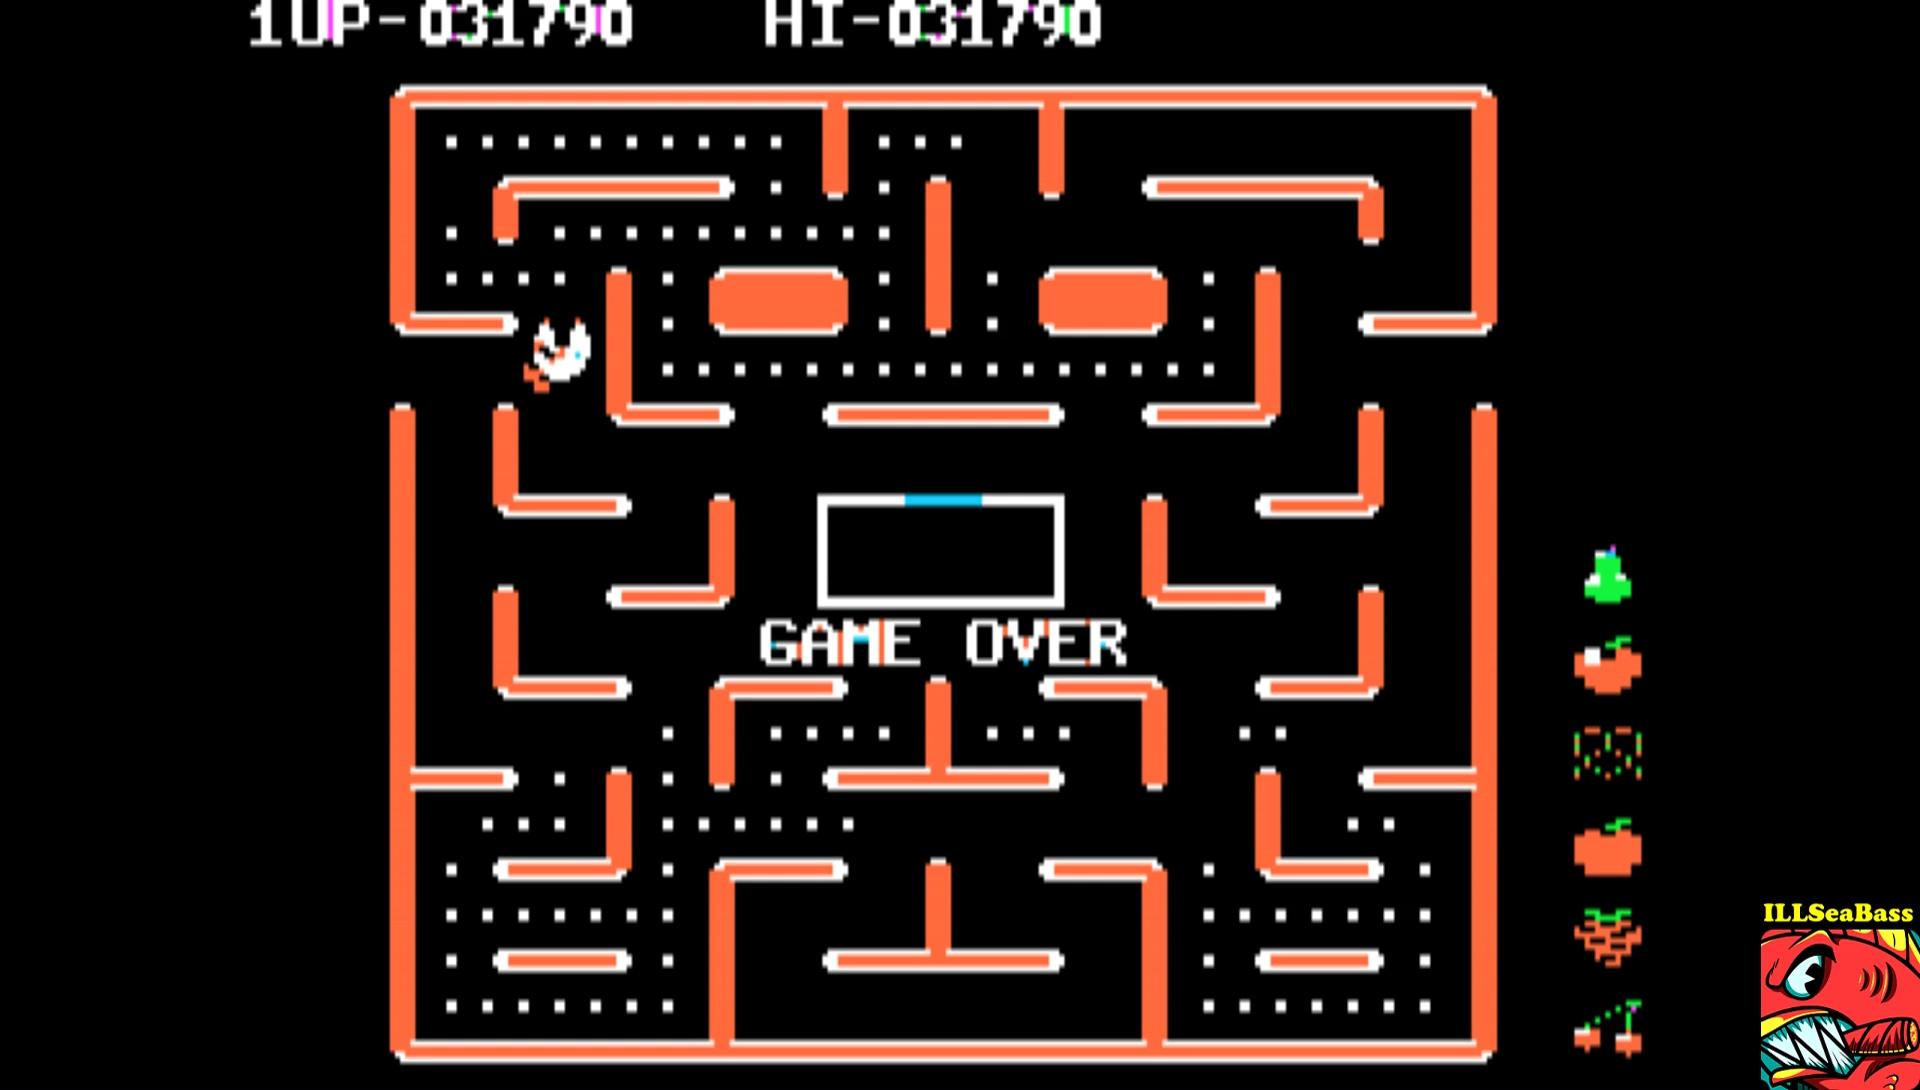 ILLSeaBass: Ms. Pac-Man (Apple II Emulated) 31,790 points on 2017-02-21 00:19:55